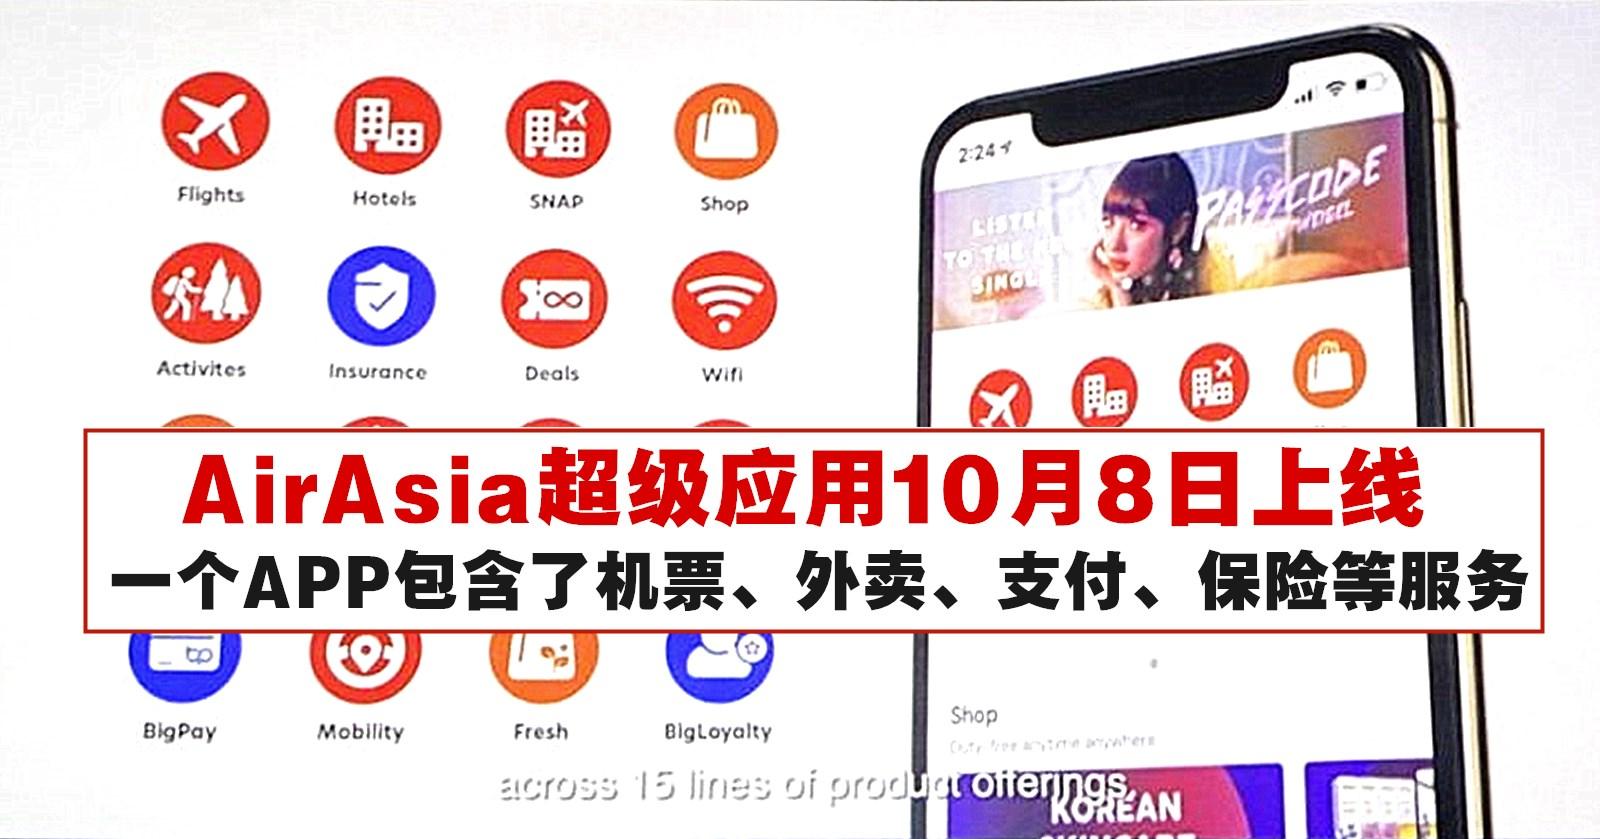 AirAsia超级应用10月8日上线,一个APP包含了机票、外卖、支付、保险等服务